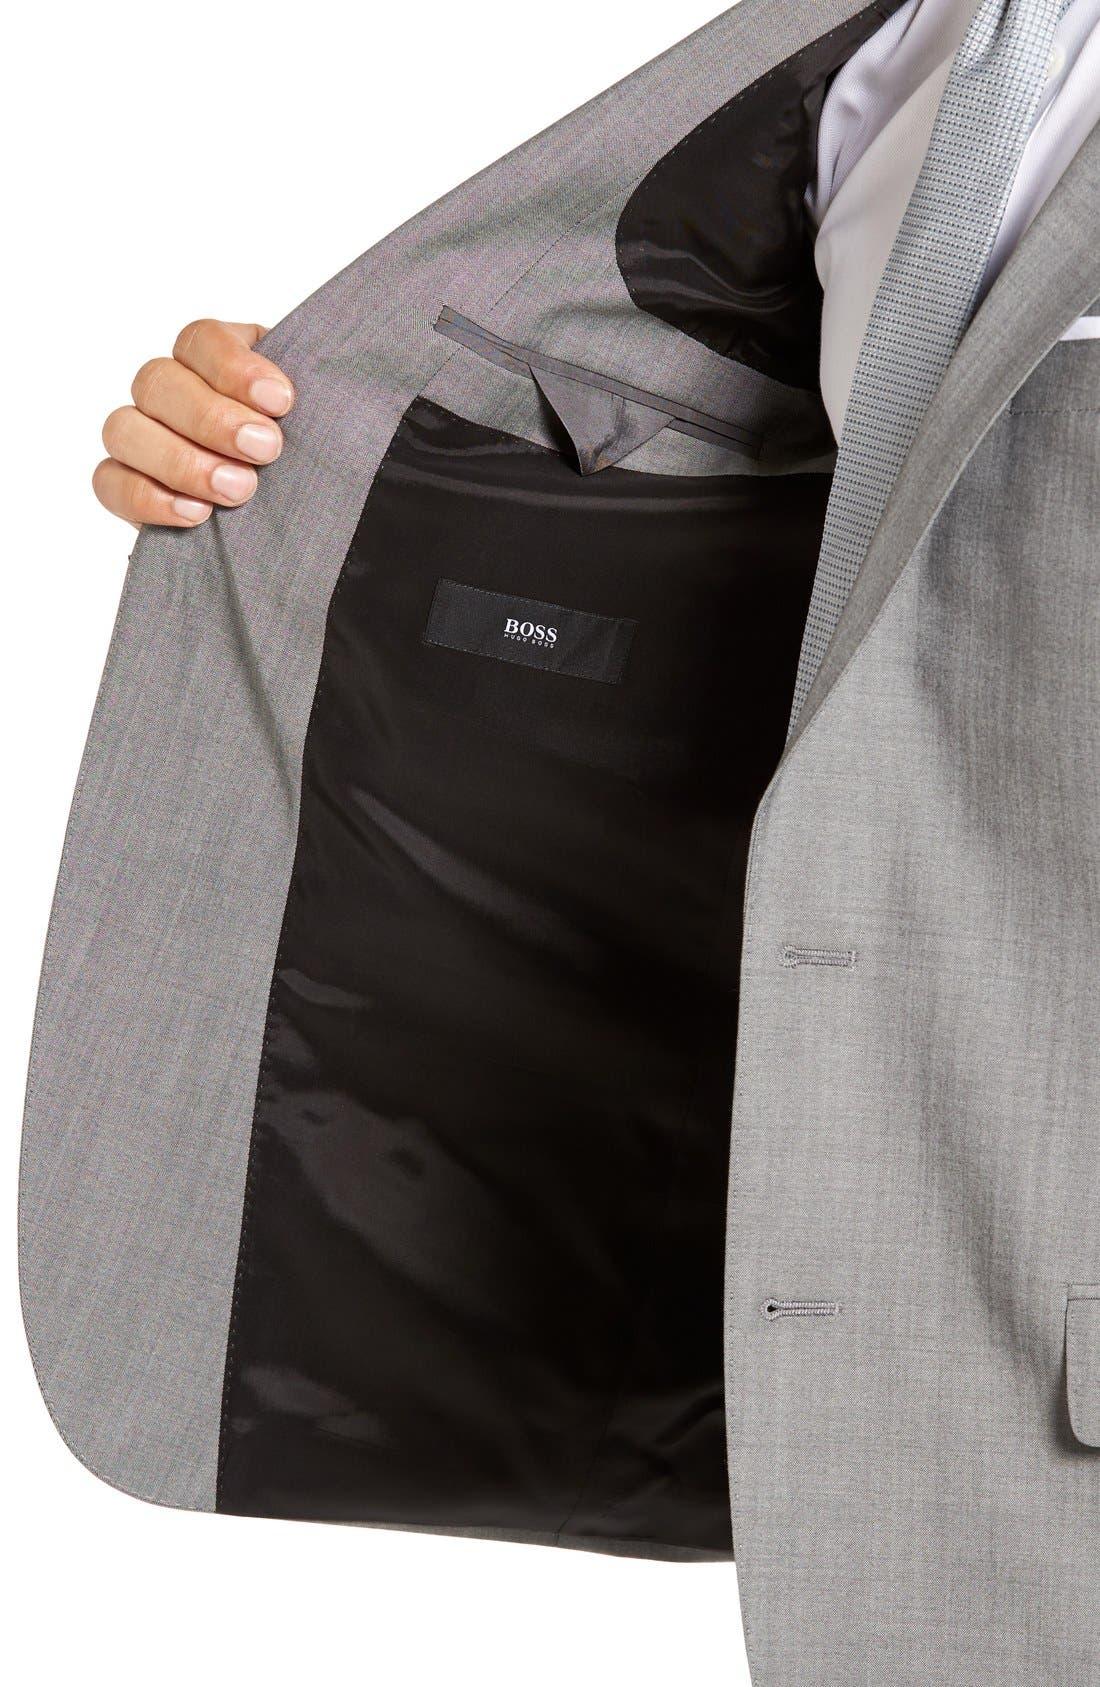 'Huge/Genius' Trim Fit Solid Wool Suit,                             Alternate thumbnail 7, color,                             PEARL GREY